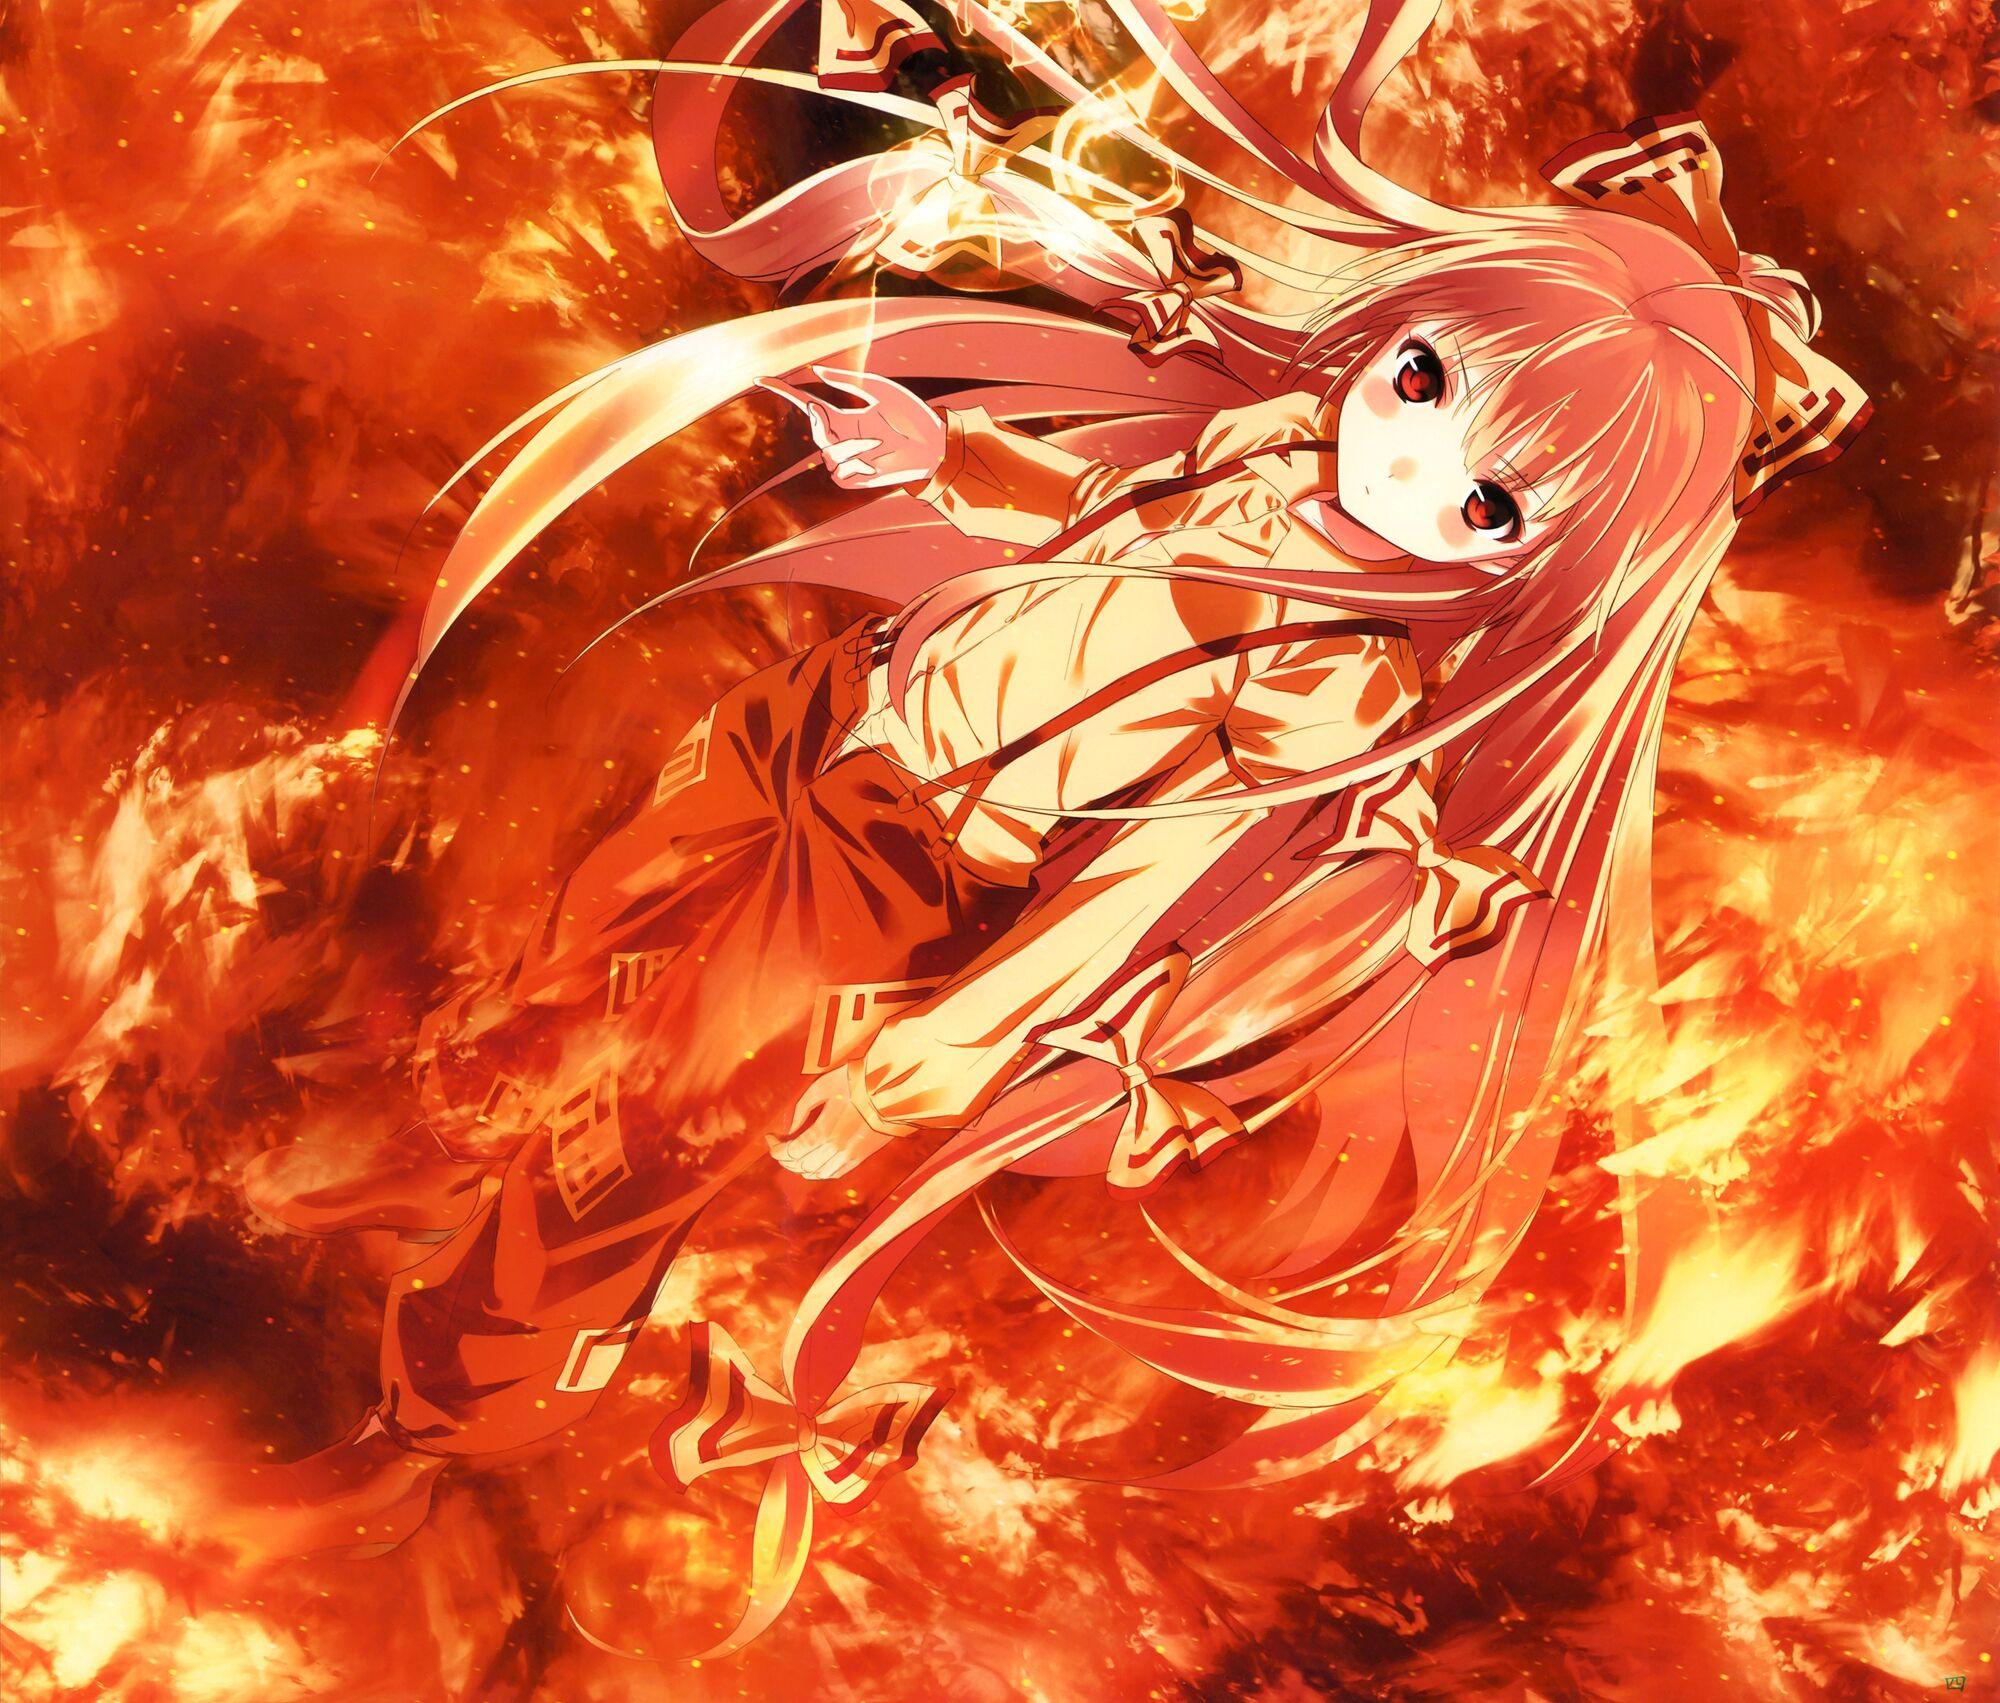 Kasai fairy tail fanon wiki fandom powered by wikia - Anime girls with fire ...